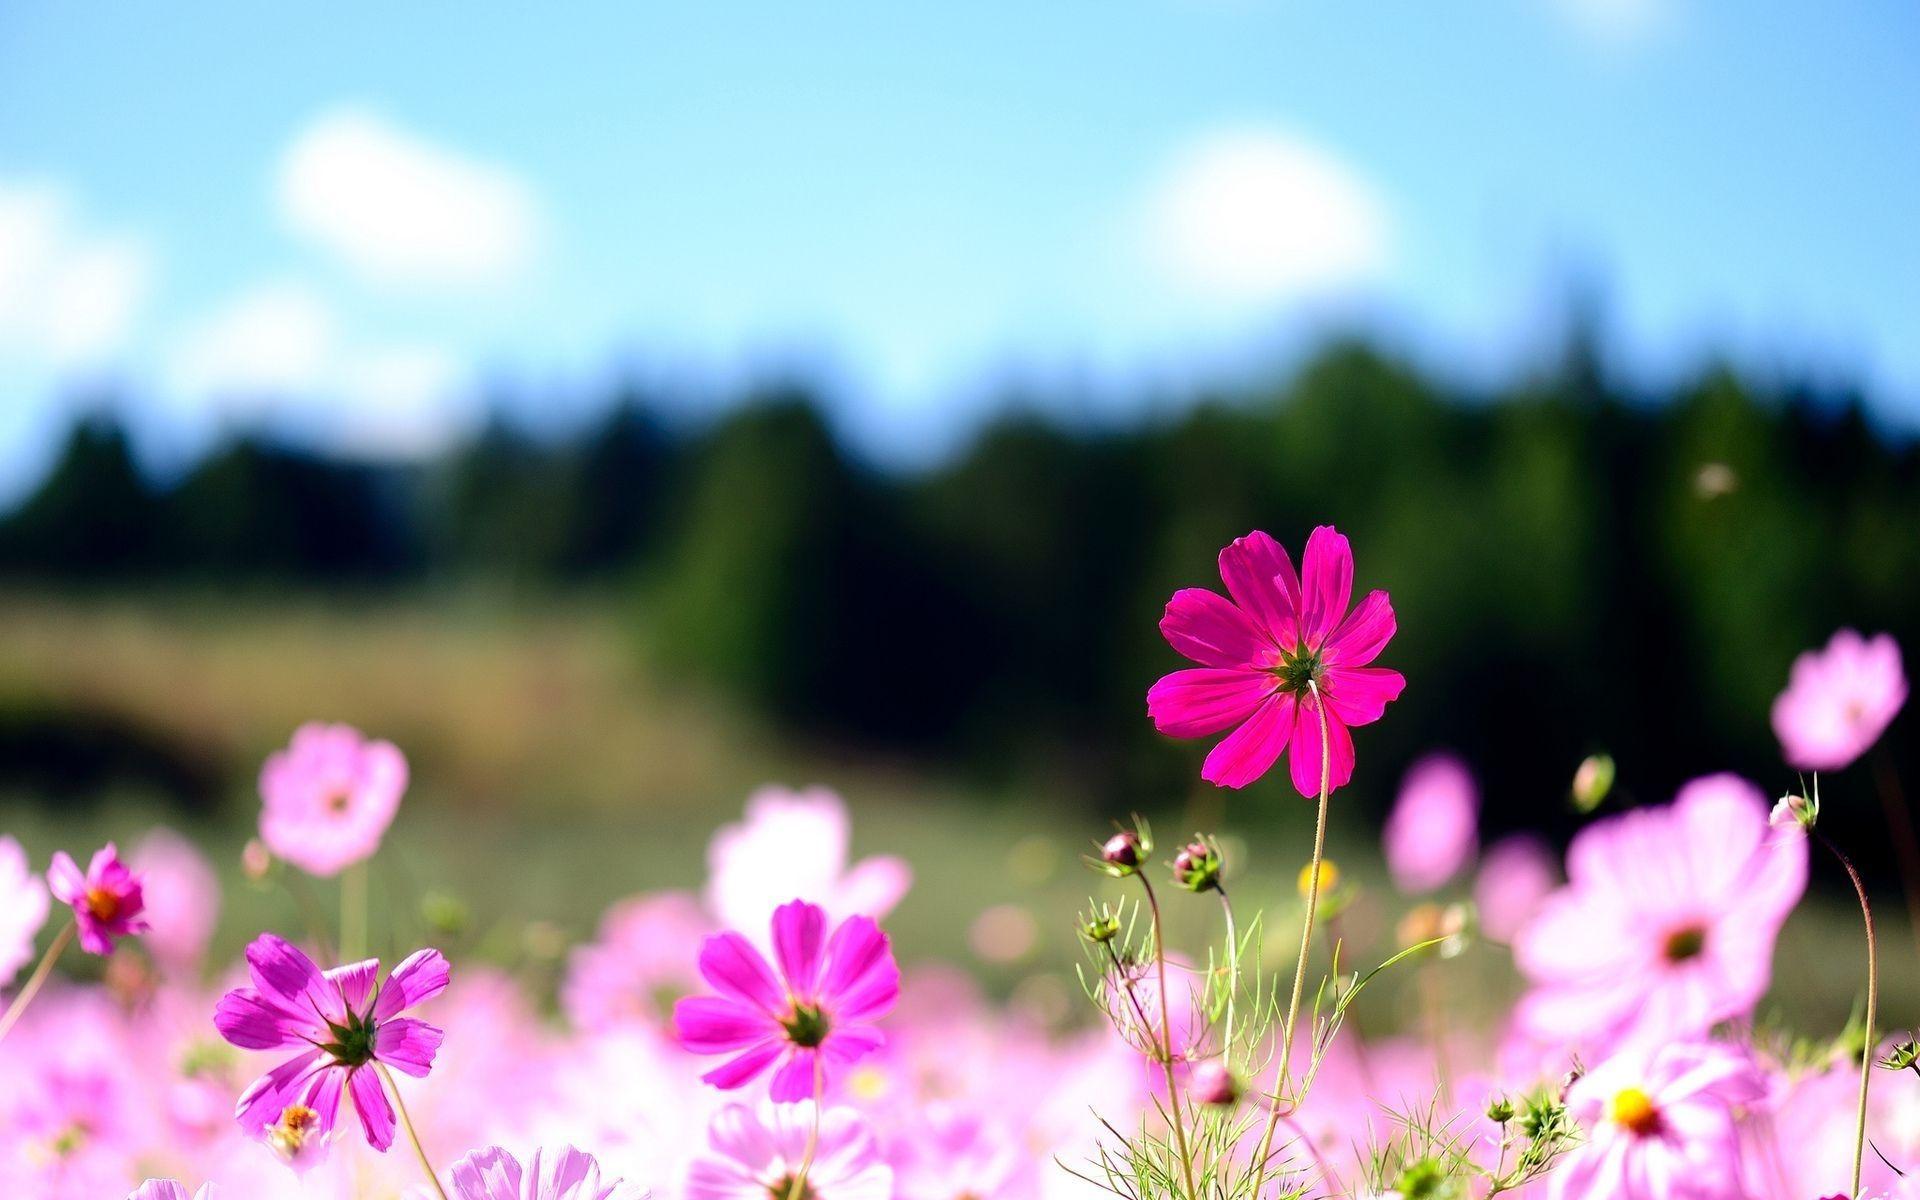 10 Top Flower Backgrounds For Computer Full Hd 1080p For Pc Background Flower Desktop Wallpaper Pink Flower Photos Flower Wallpaper